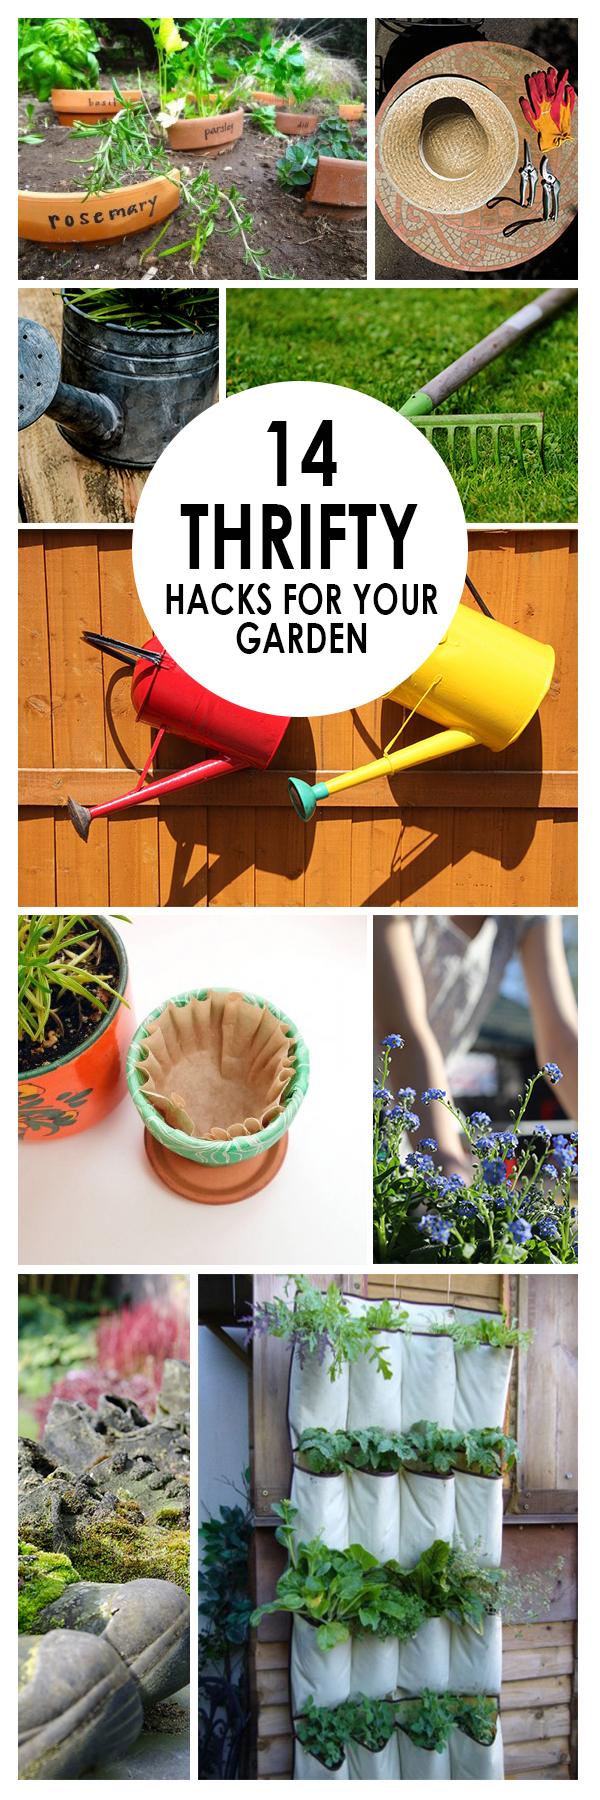 Gardening Hacks, Gardening Tips, Gardening, Gardening Tips, Gardening Ideas, Gardening for Beginners